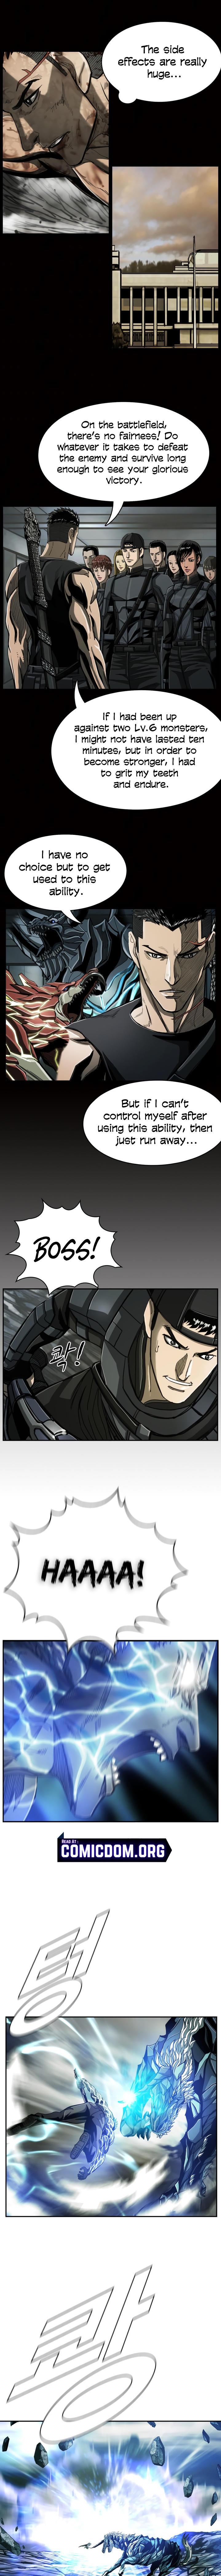 The First Hunter Chapter 72 page 6 - Mangakakalots.com